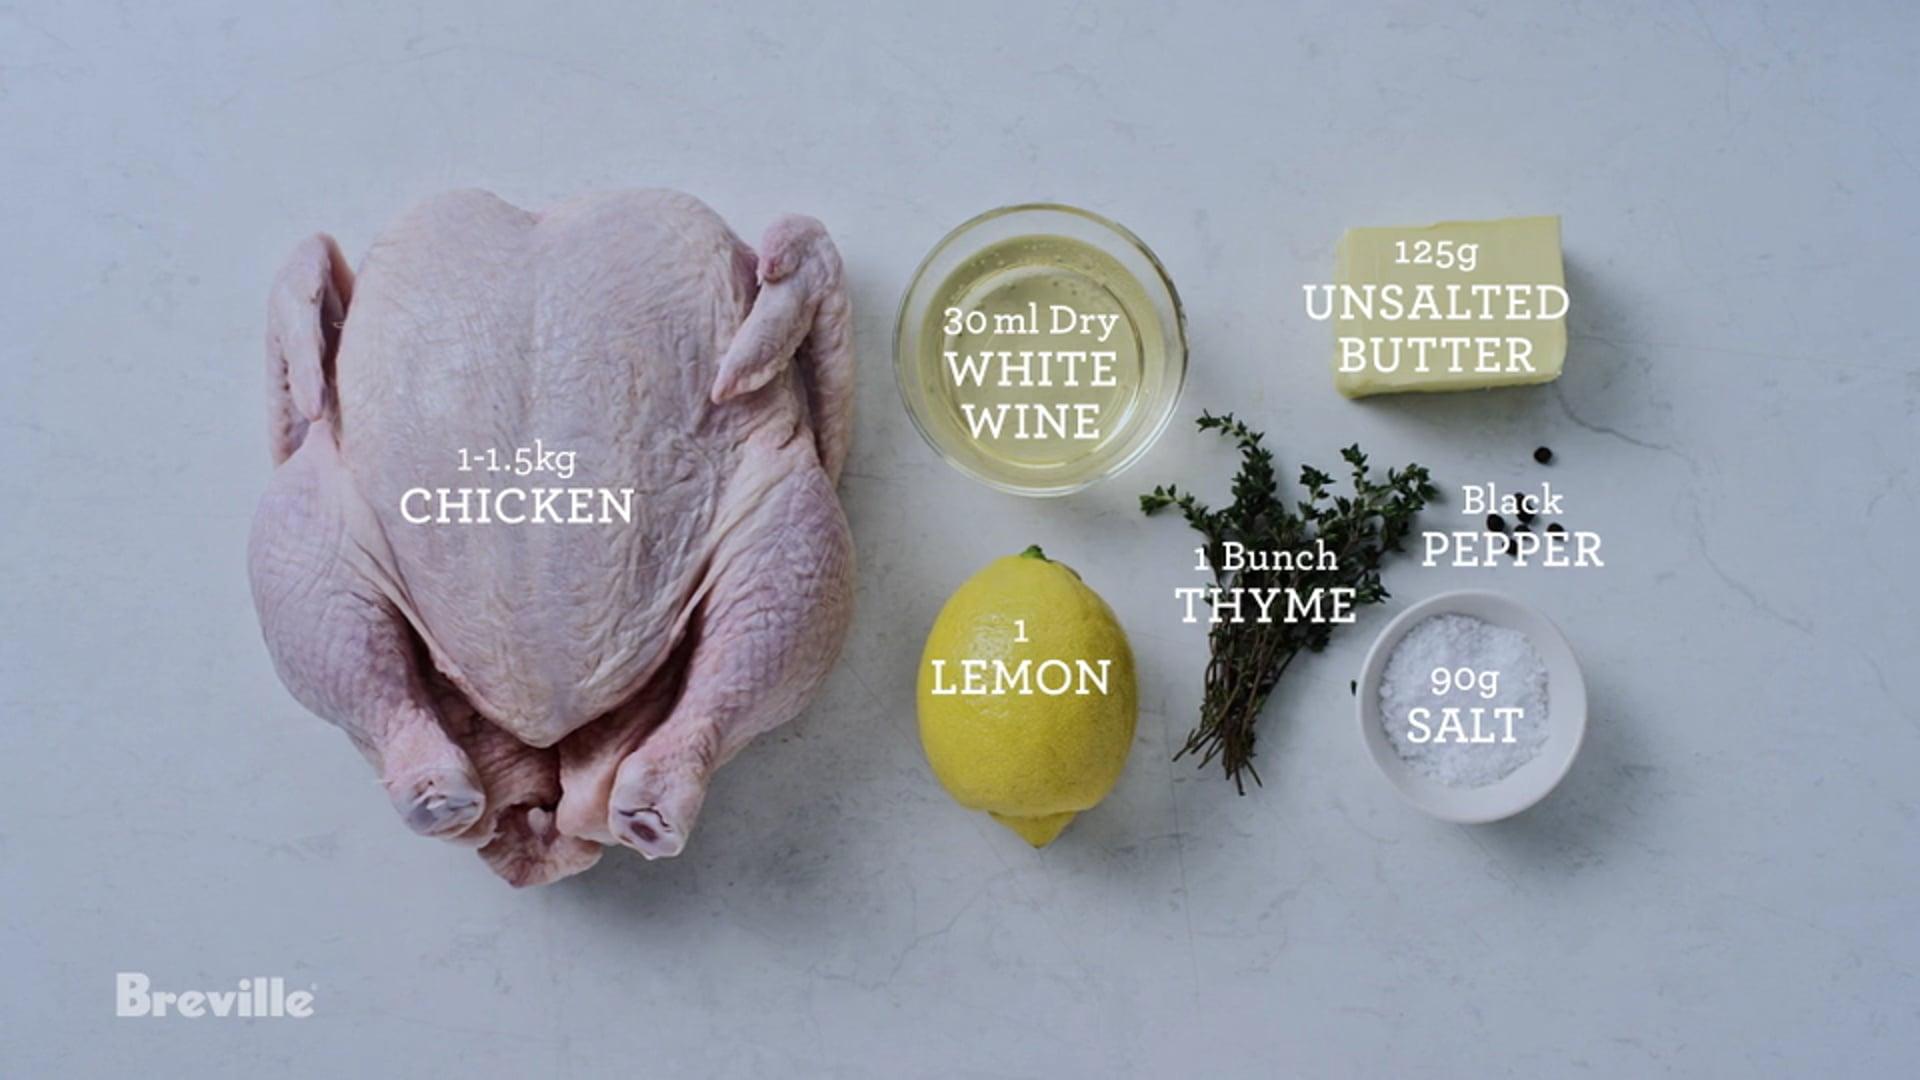 Heston for Breville- Chicken